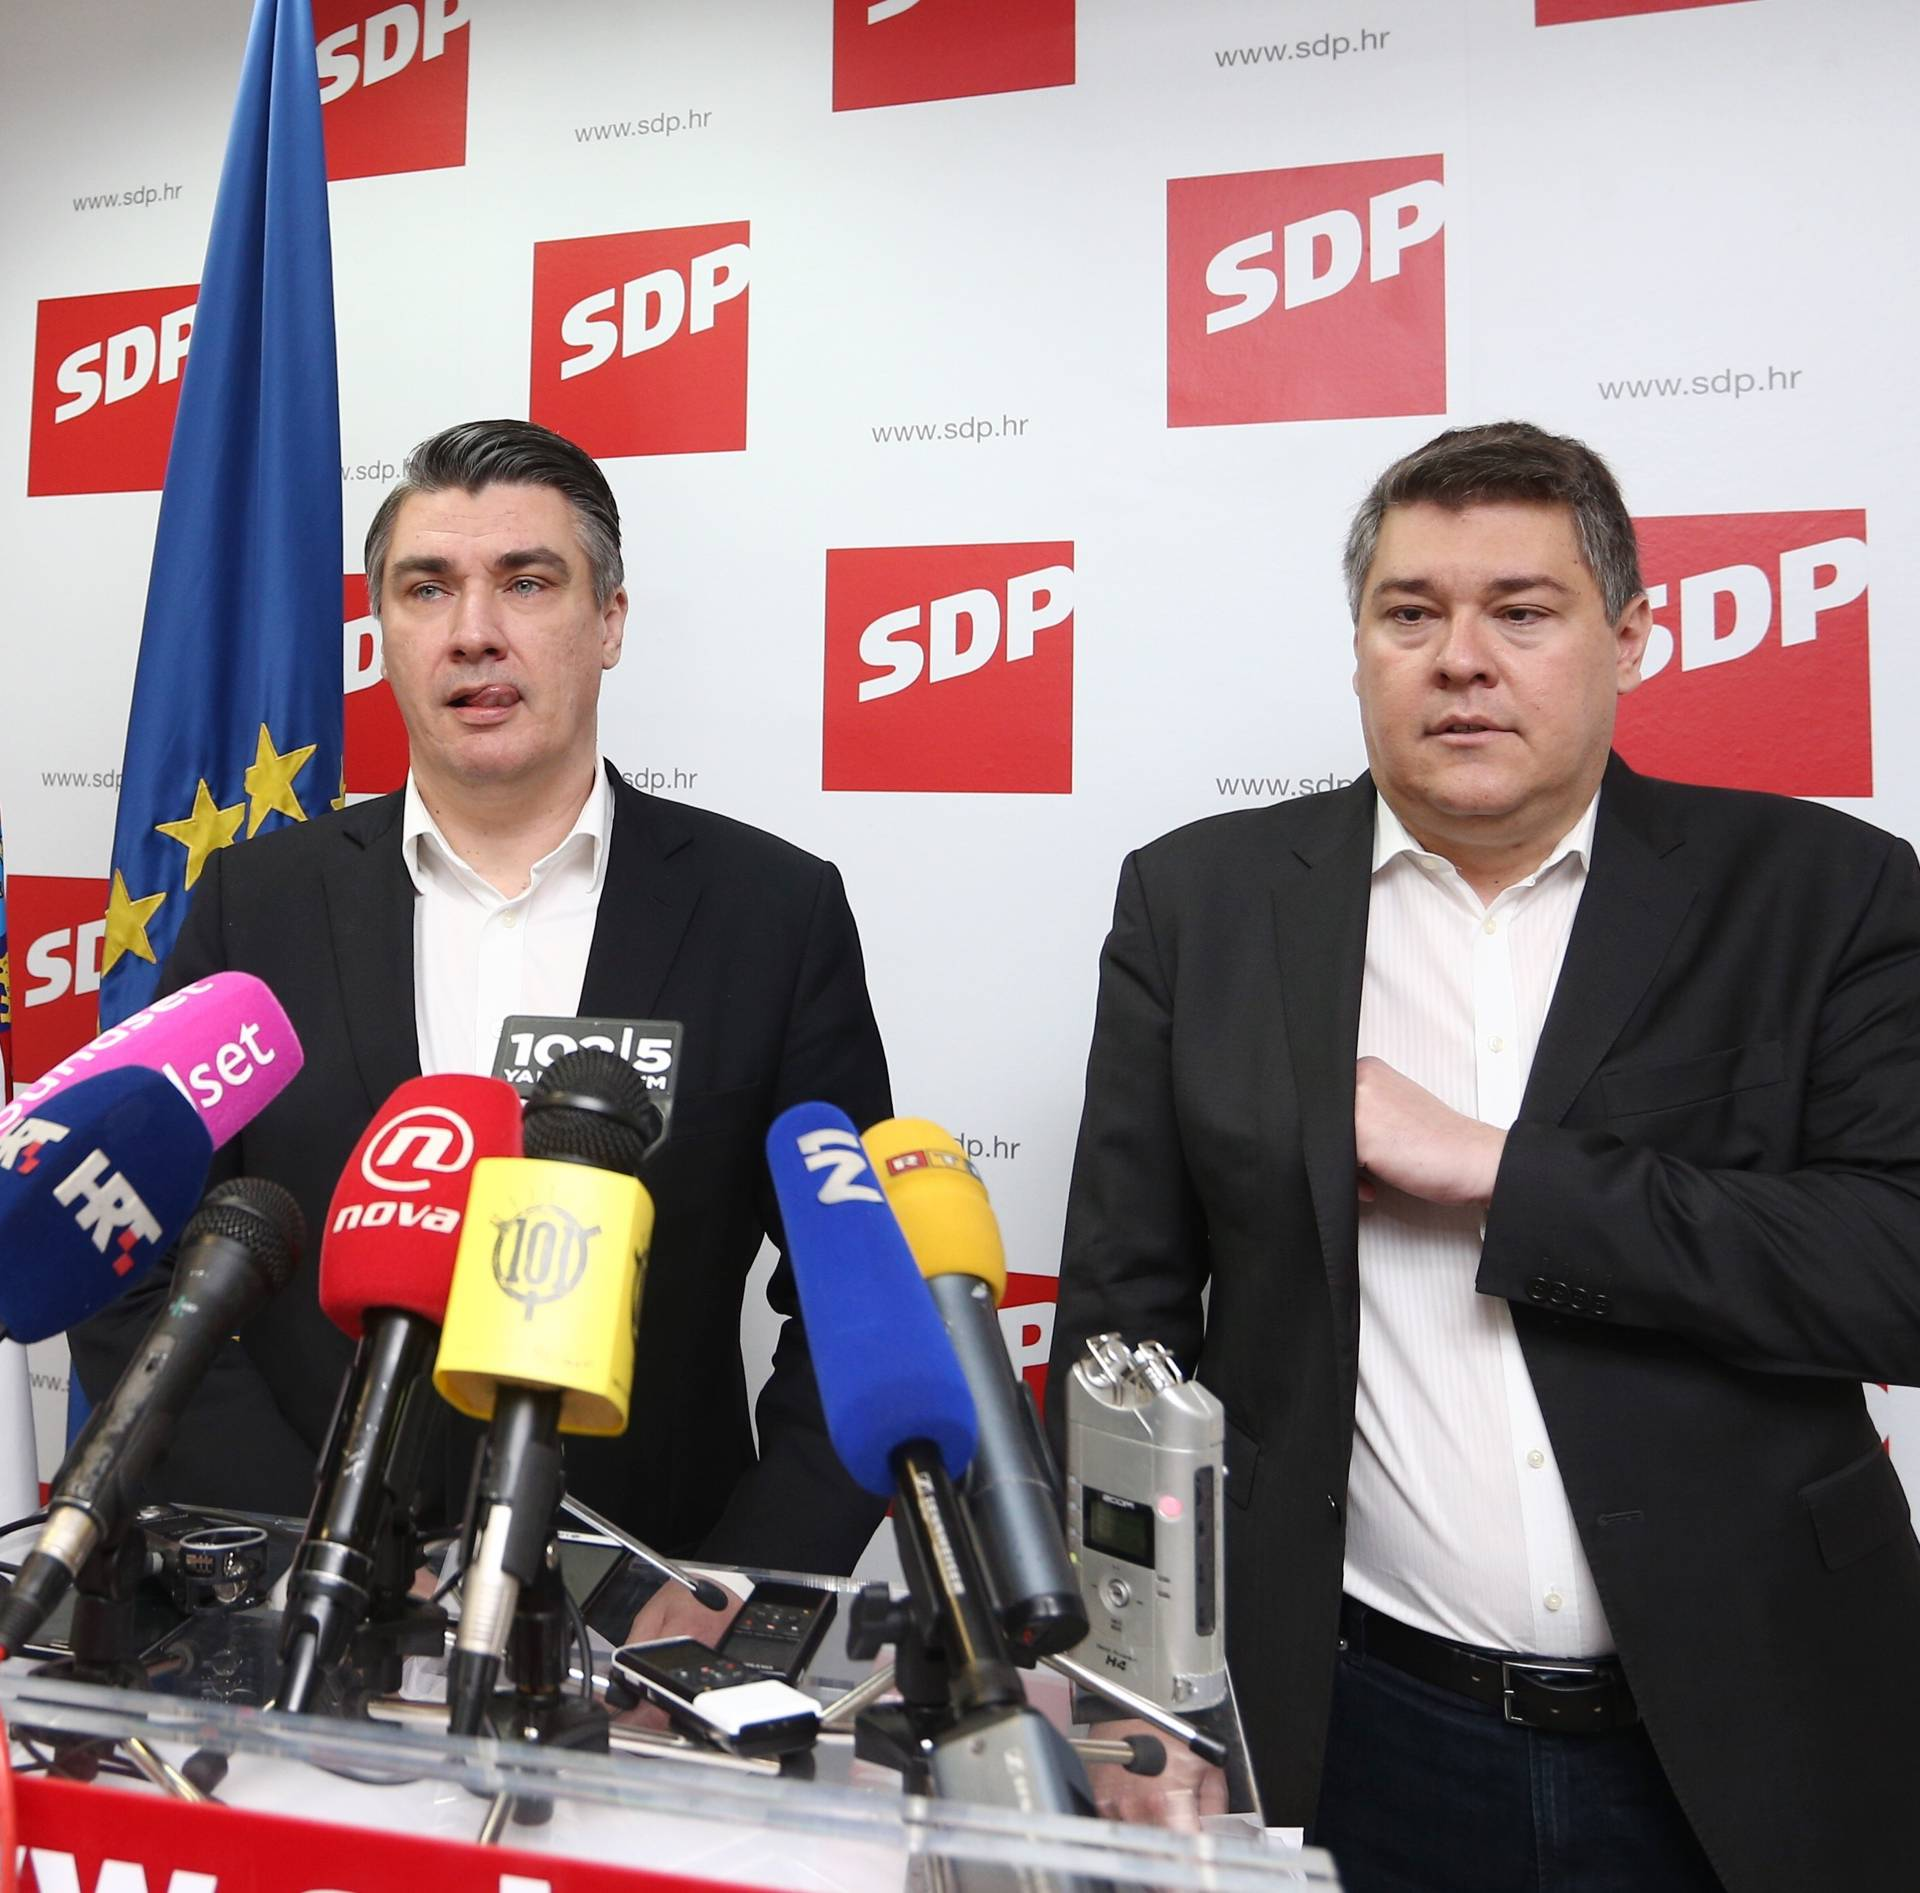 Zoran Milanović: 'Štetno je kad te usnime s ustaškom kapom'